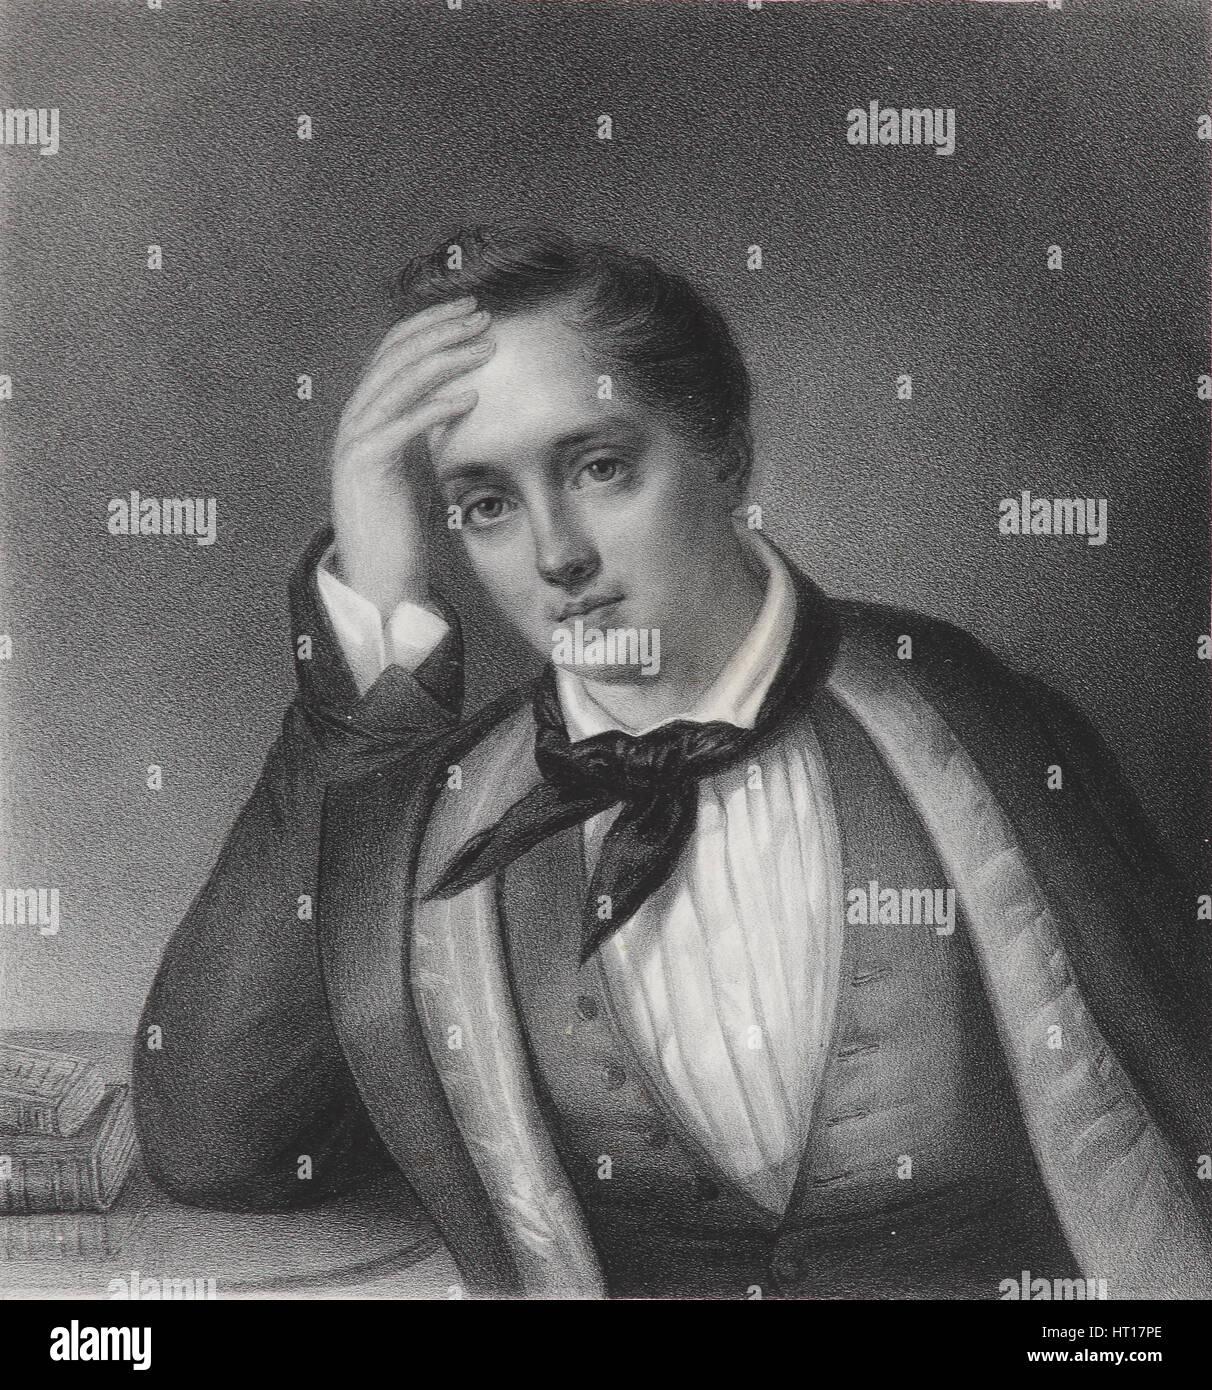 Portrait of the poet Yevgeny Abramovich Baratynsky (1800-1844), 1830s. Artist: Chevalier, Ferdinand (active Mid - Stock Image